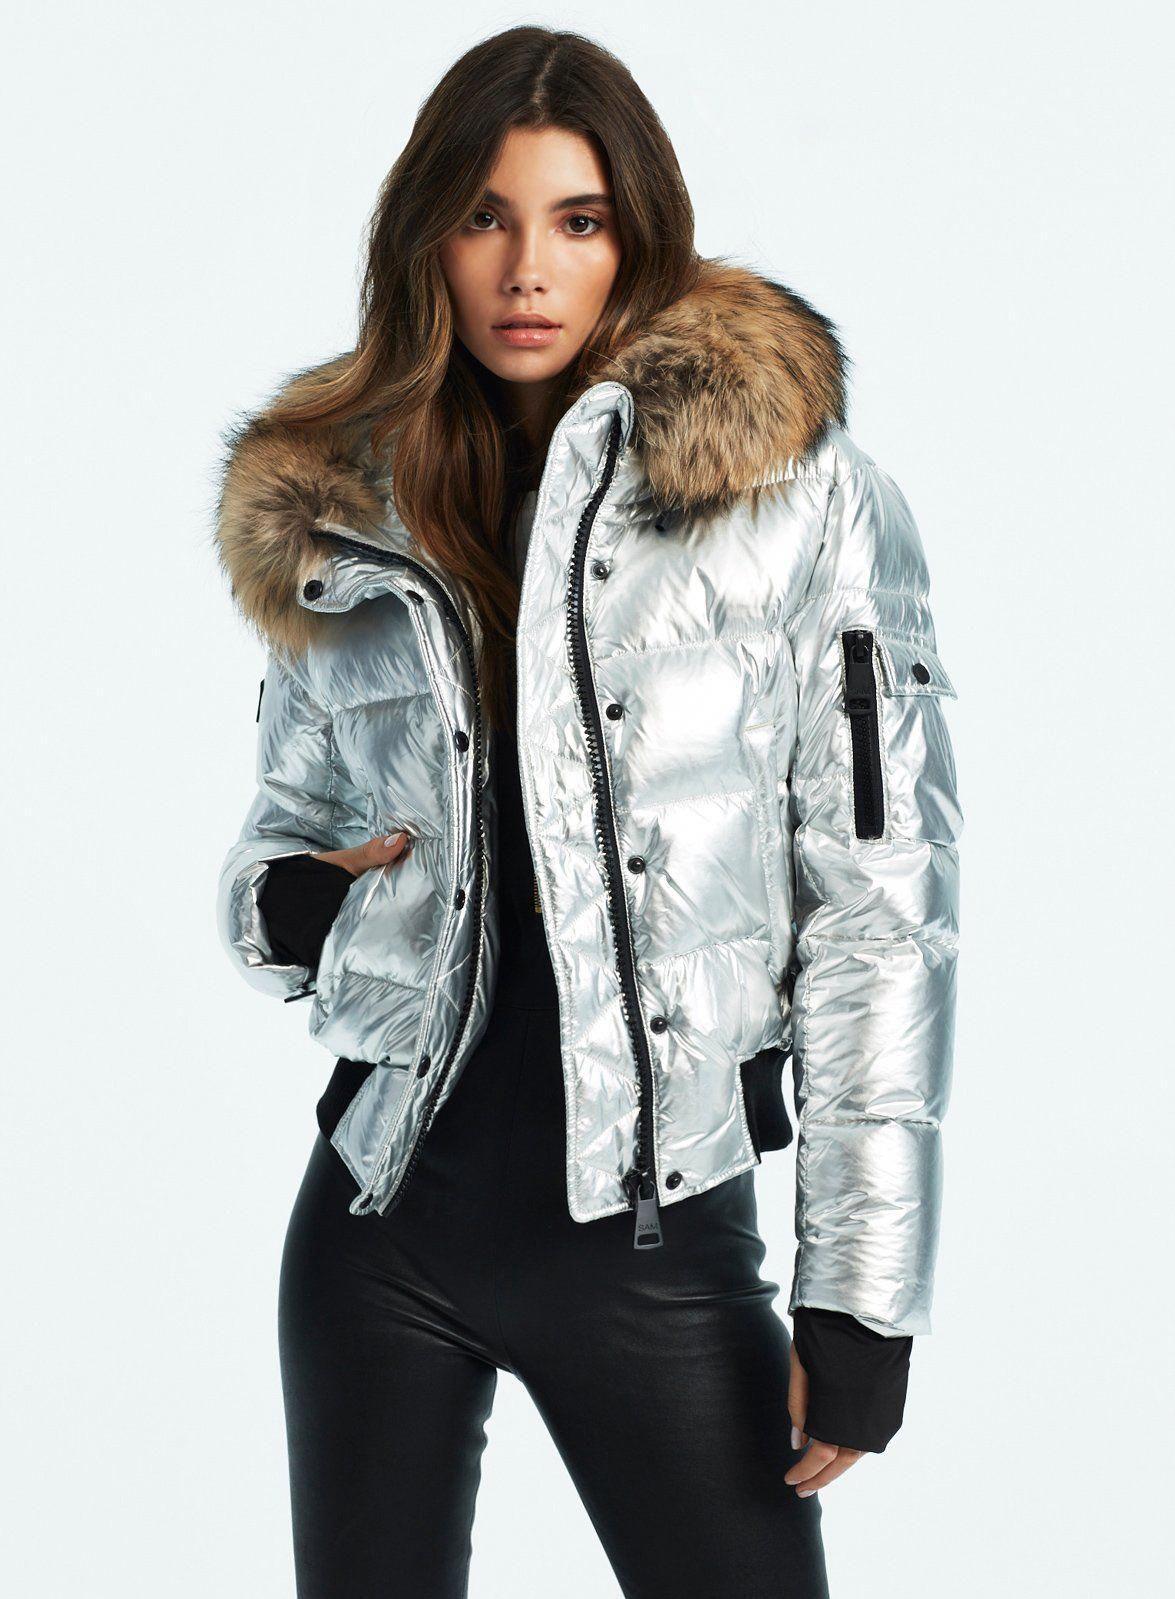 Raincoatsforwomen Bestwomensraincoat2018 Puffer Jacket Women Jackets Leggings Store [ 1599 x 1175 Pixel ]